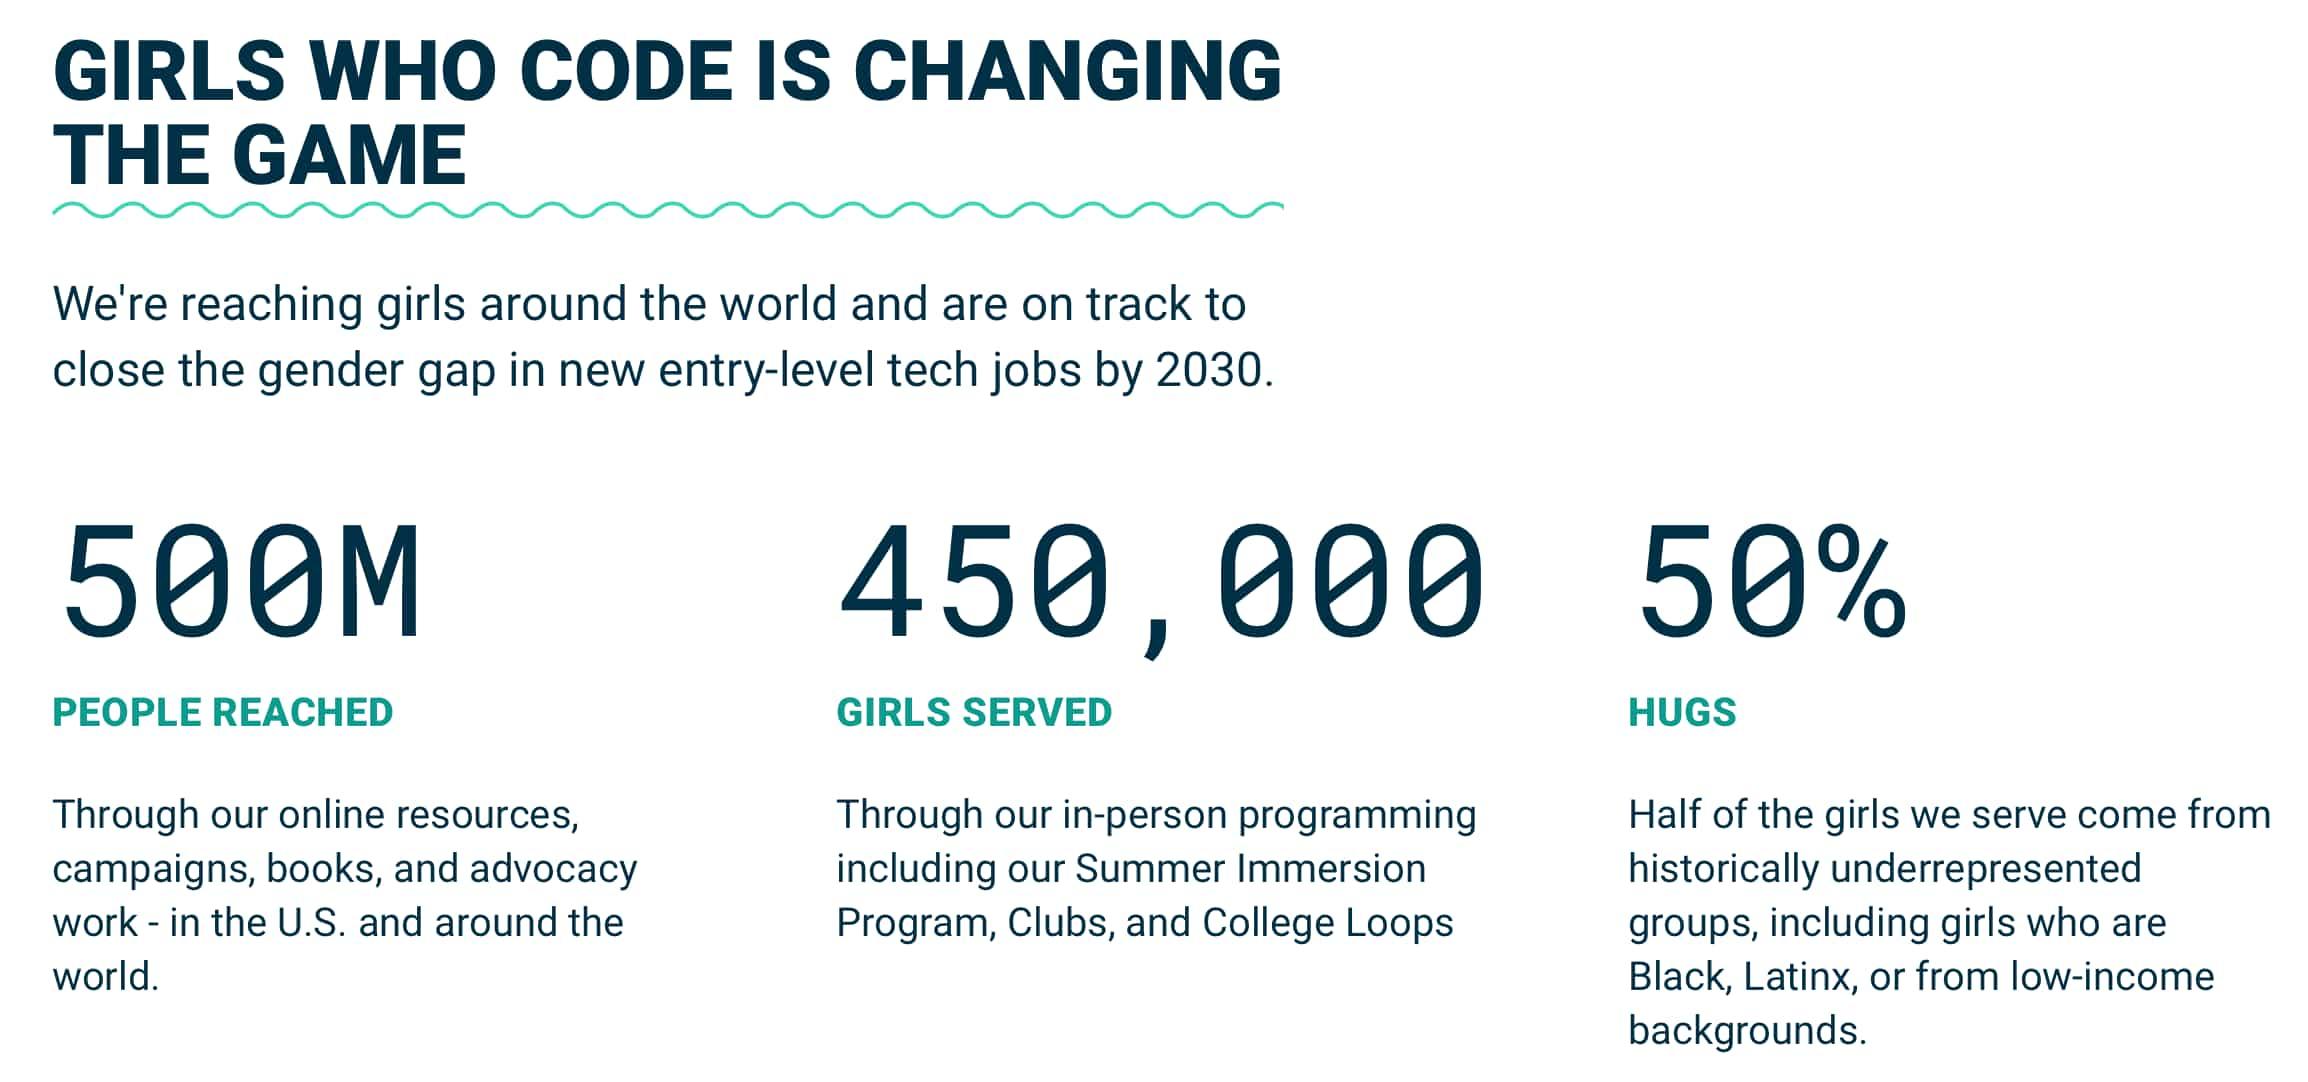 girls who code coding technology gender gap women programming non binary trans people US USA